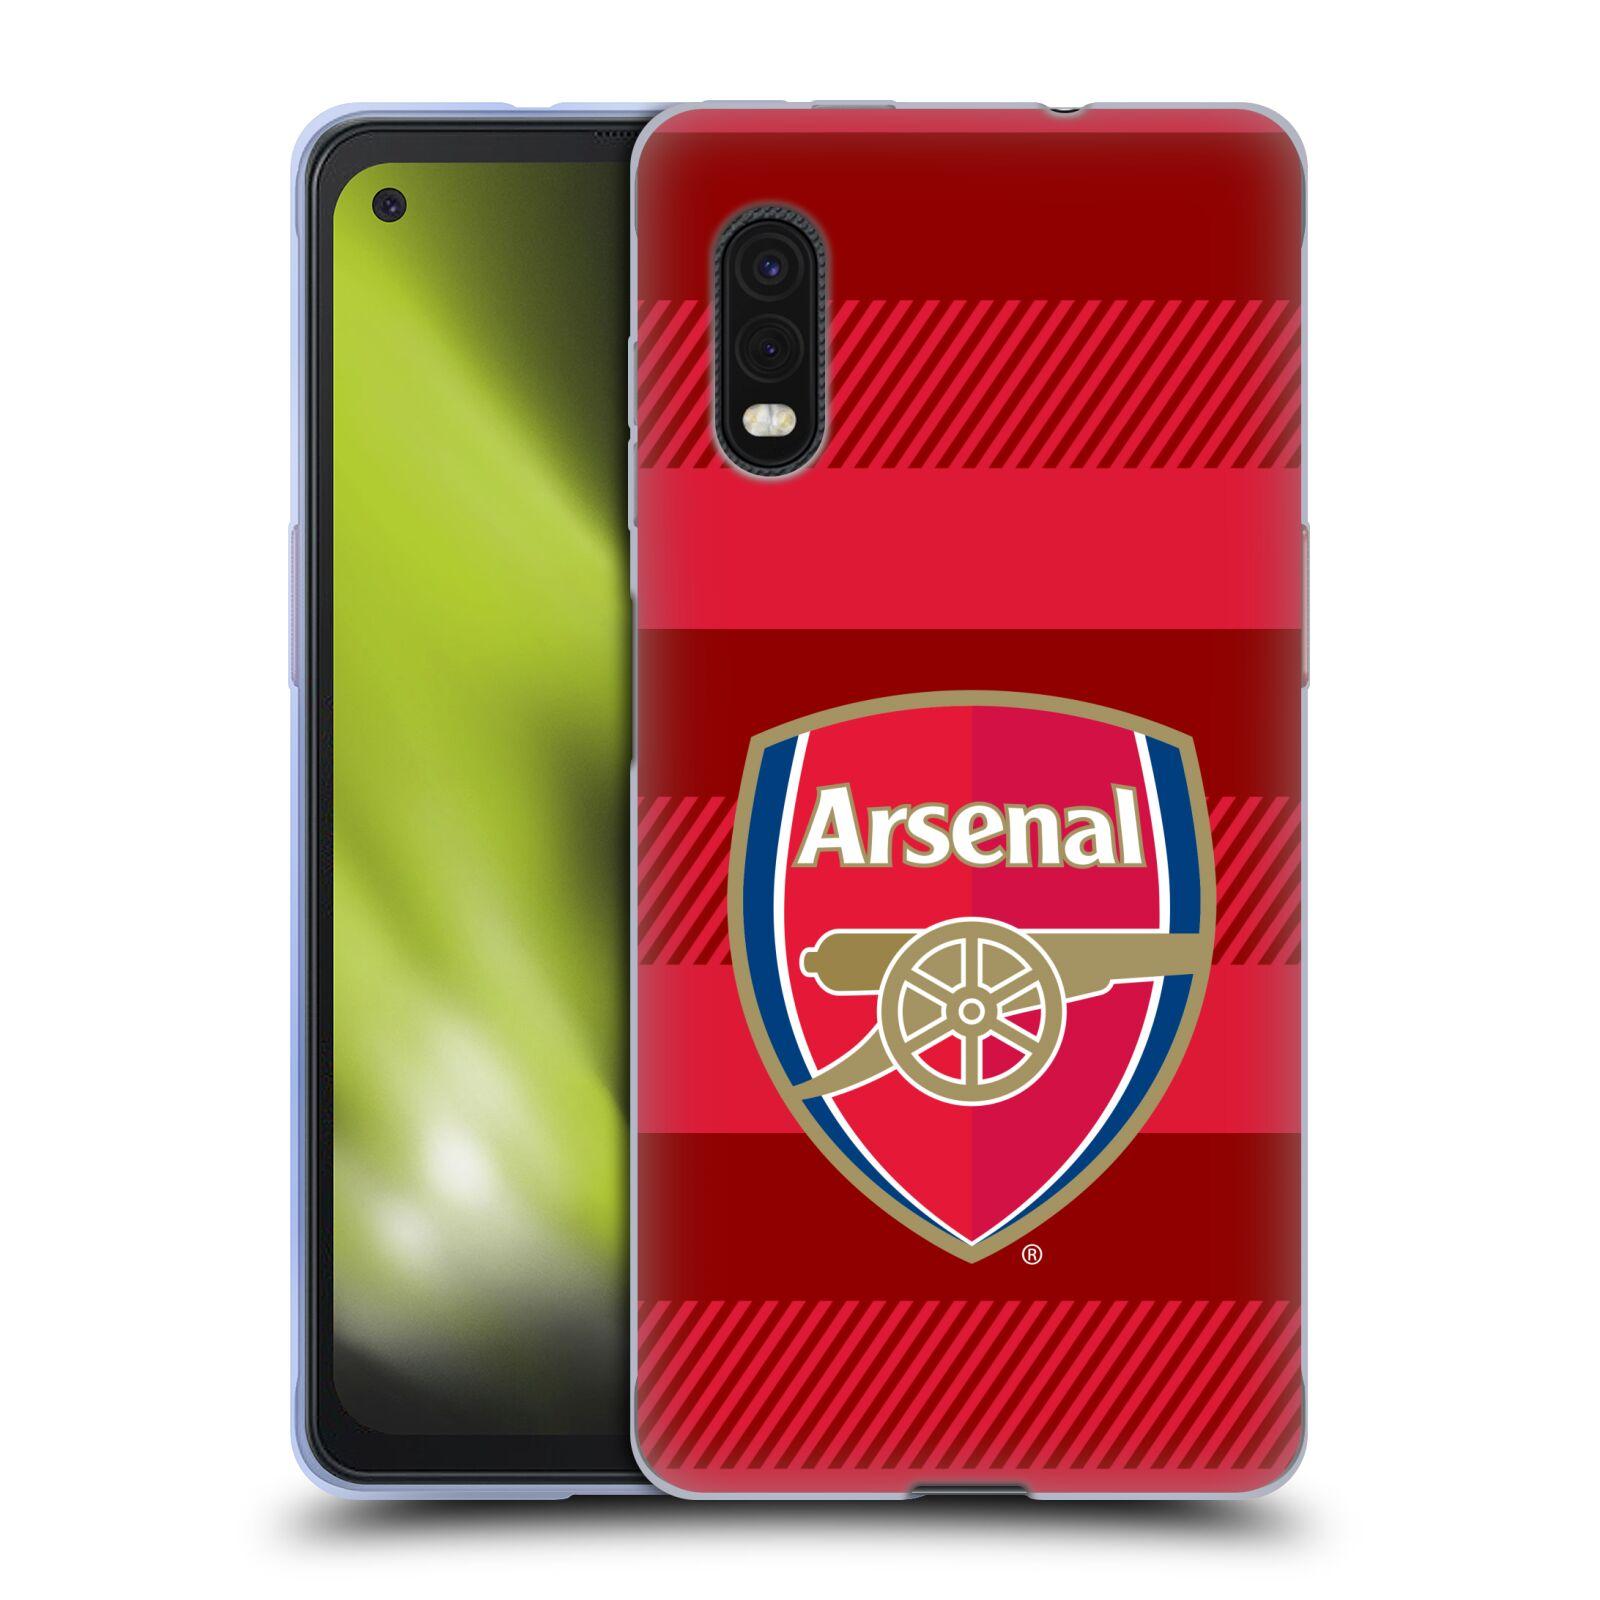 Silikonové pouzdro na mobil Samsung Galaxy Xcover Pro - Head Case - Arsenal FC - Logo s pruhy